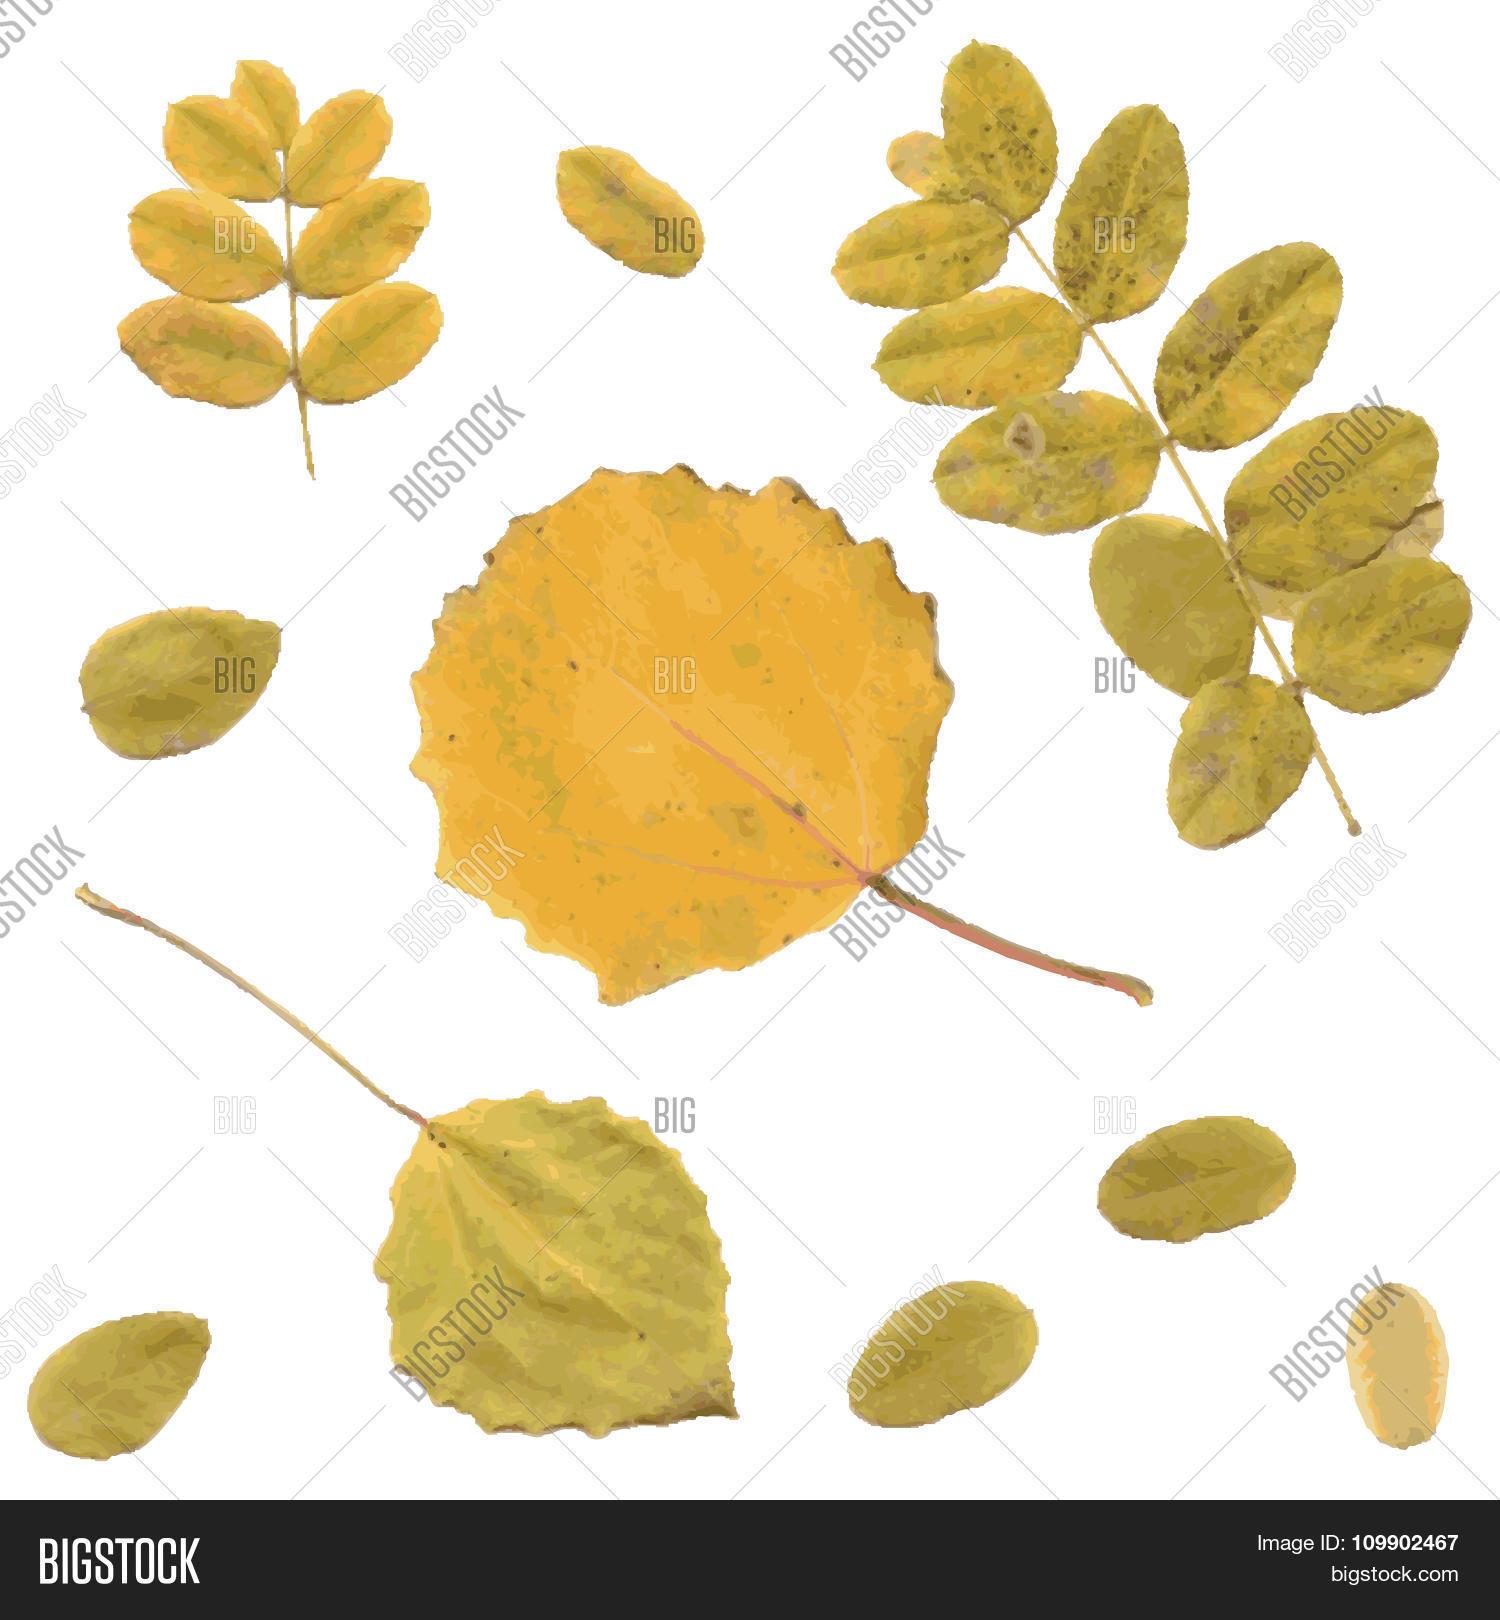 Autumn rowan, birch or Betula, aspen or Populus tremula leaves.